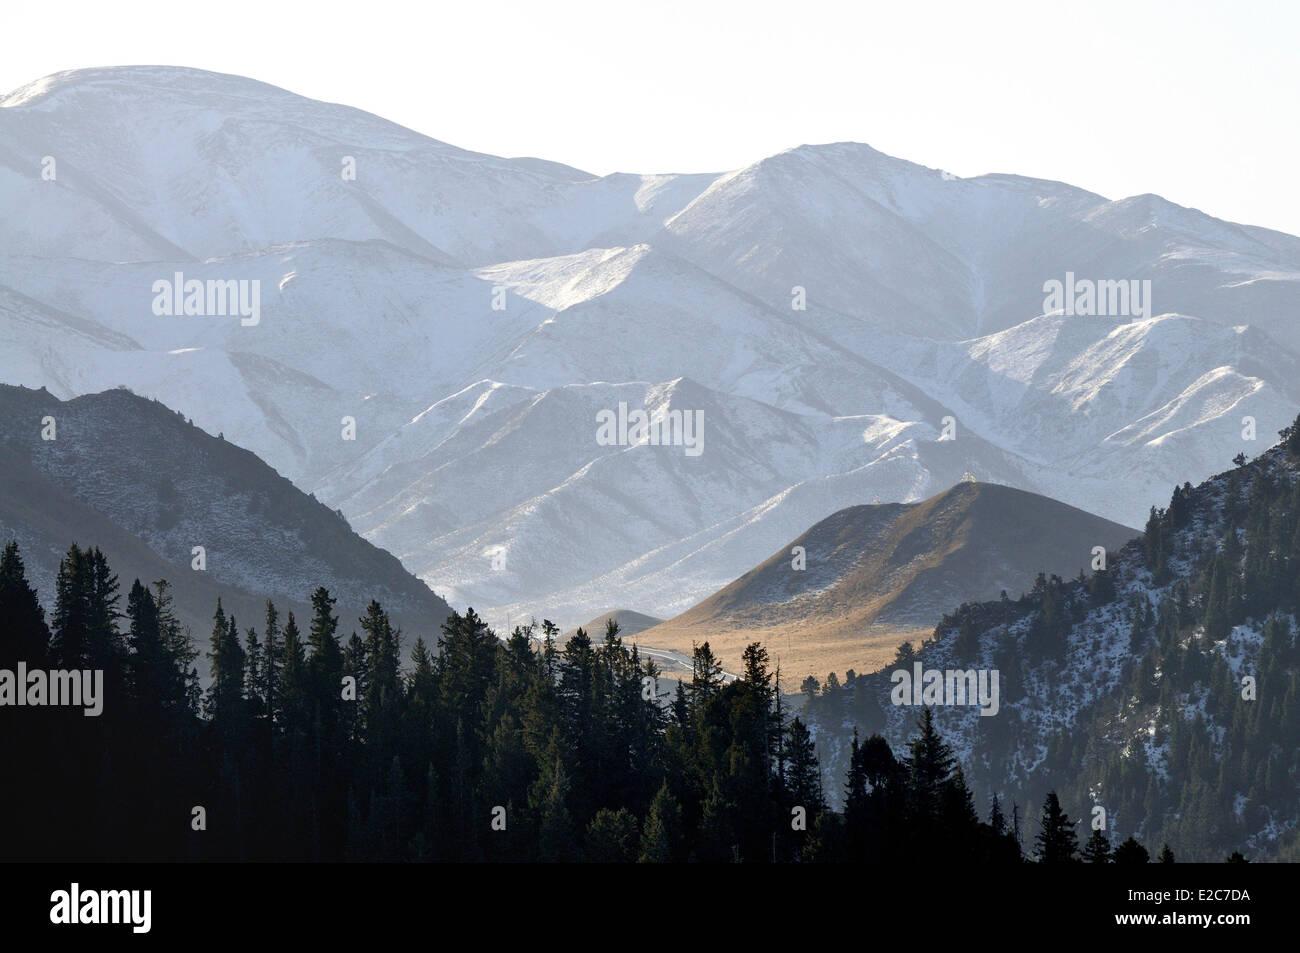 Cina, Provincia di Qinghai, Amdo, Tongren (Rebkong) contea, Tashi Kyil monastero nei dintorni Immagini Stock